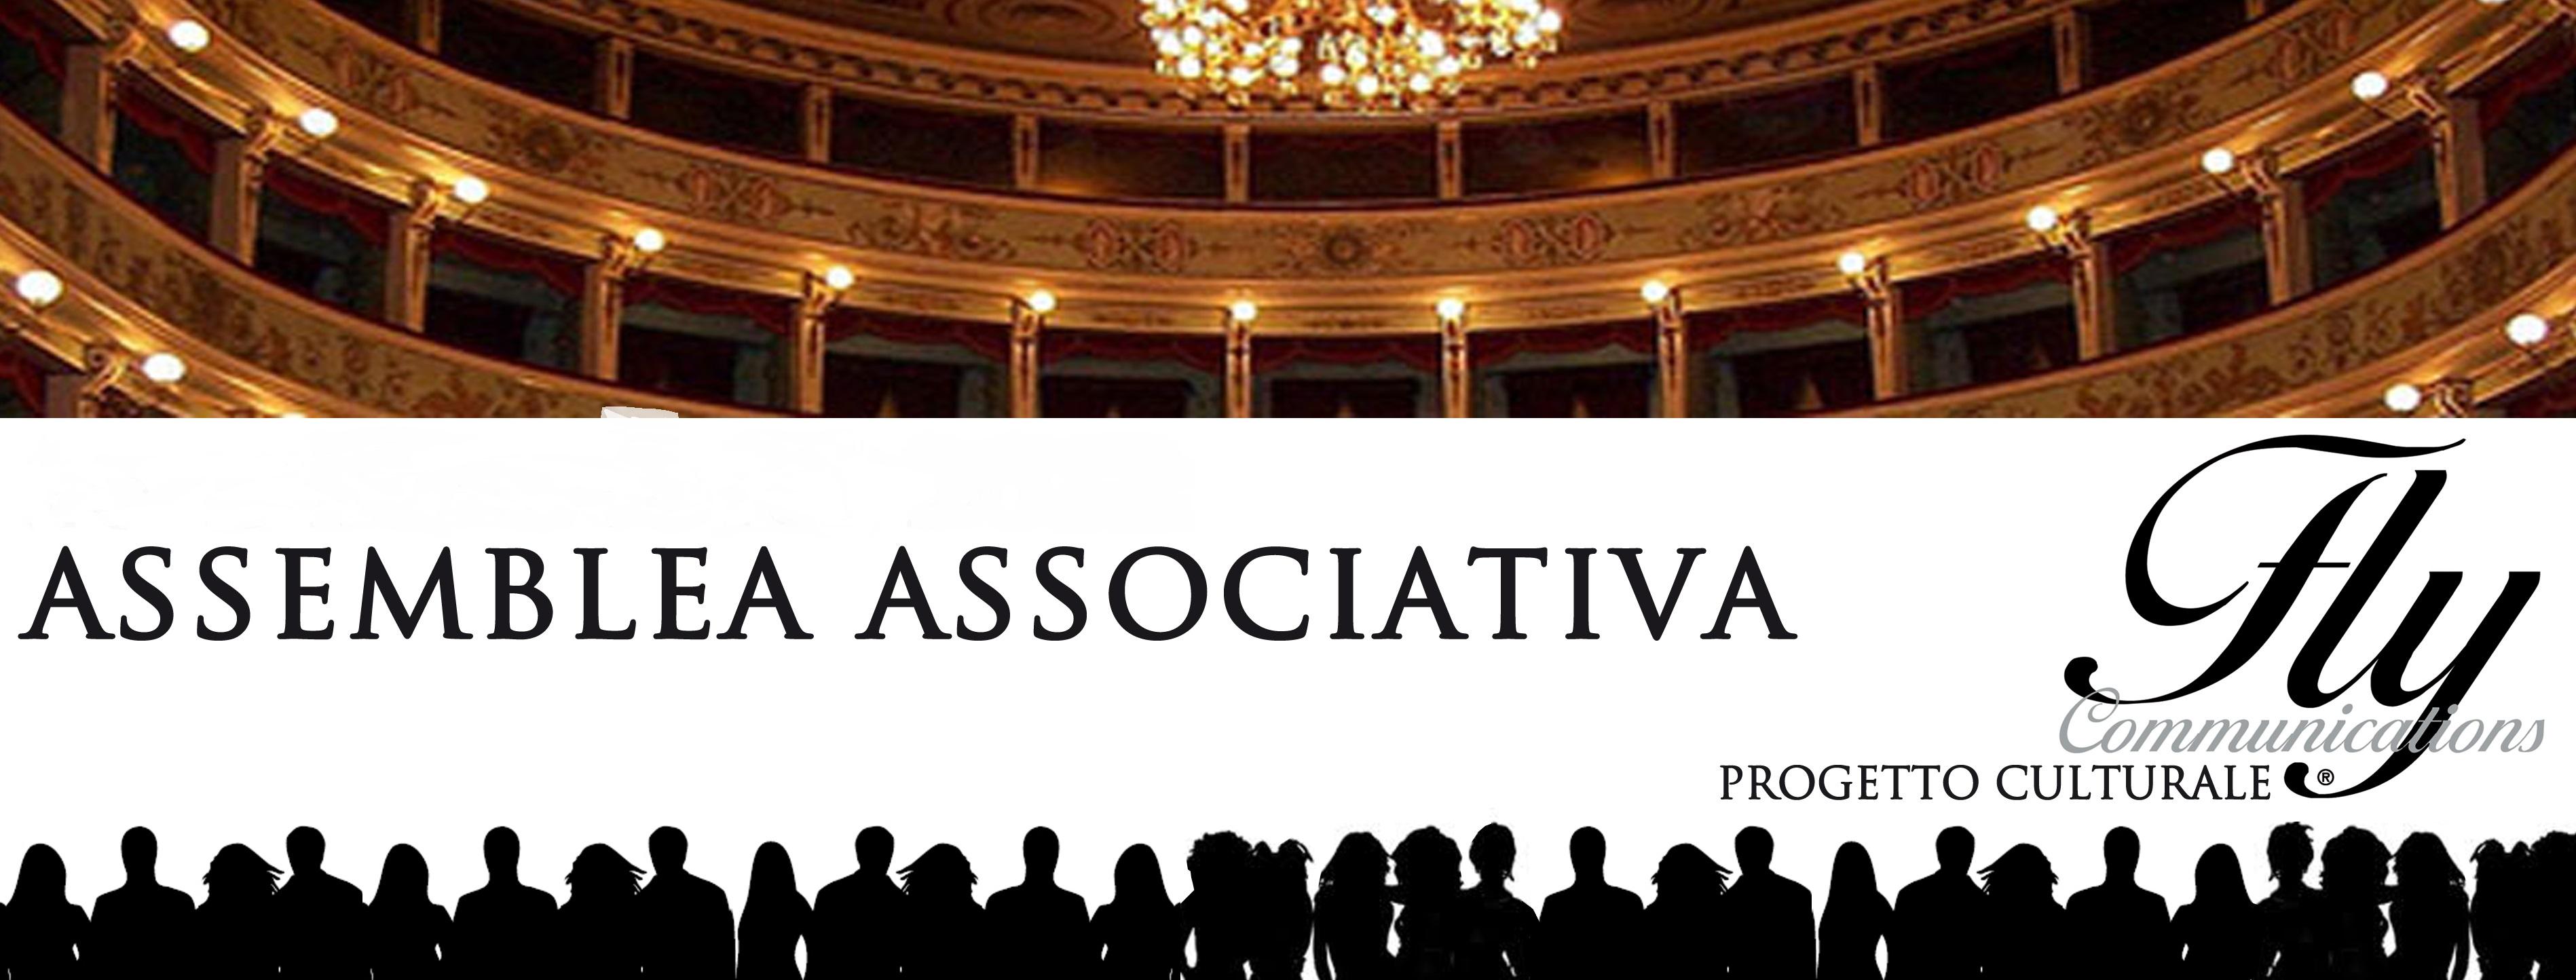 Convocazione Assemblea Associativa